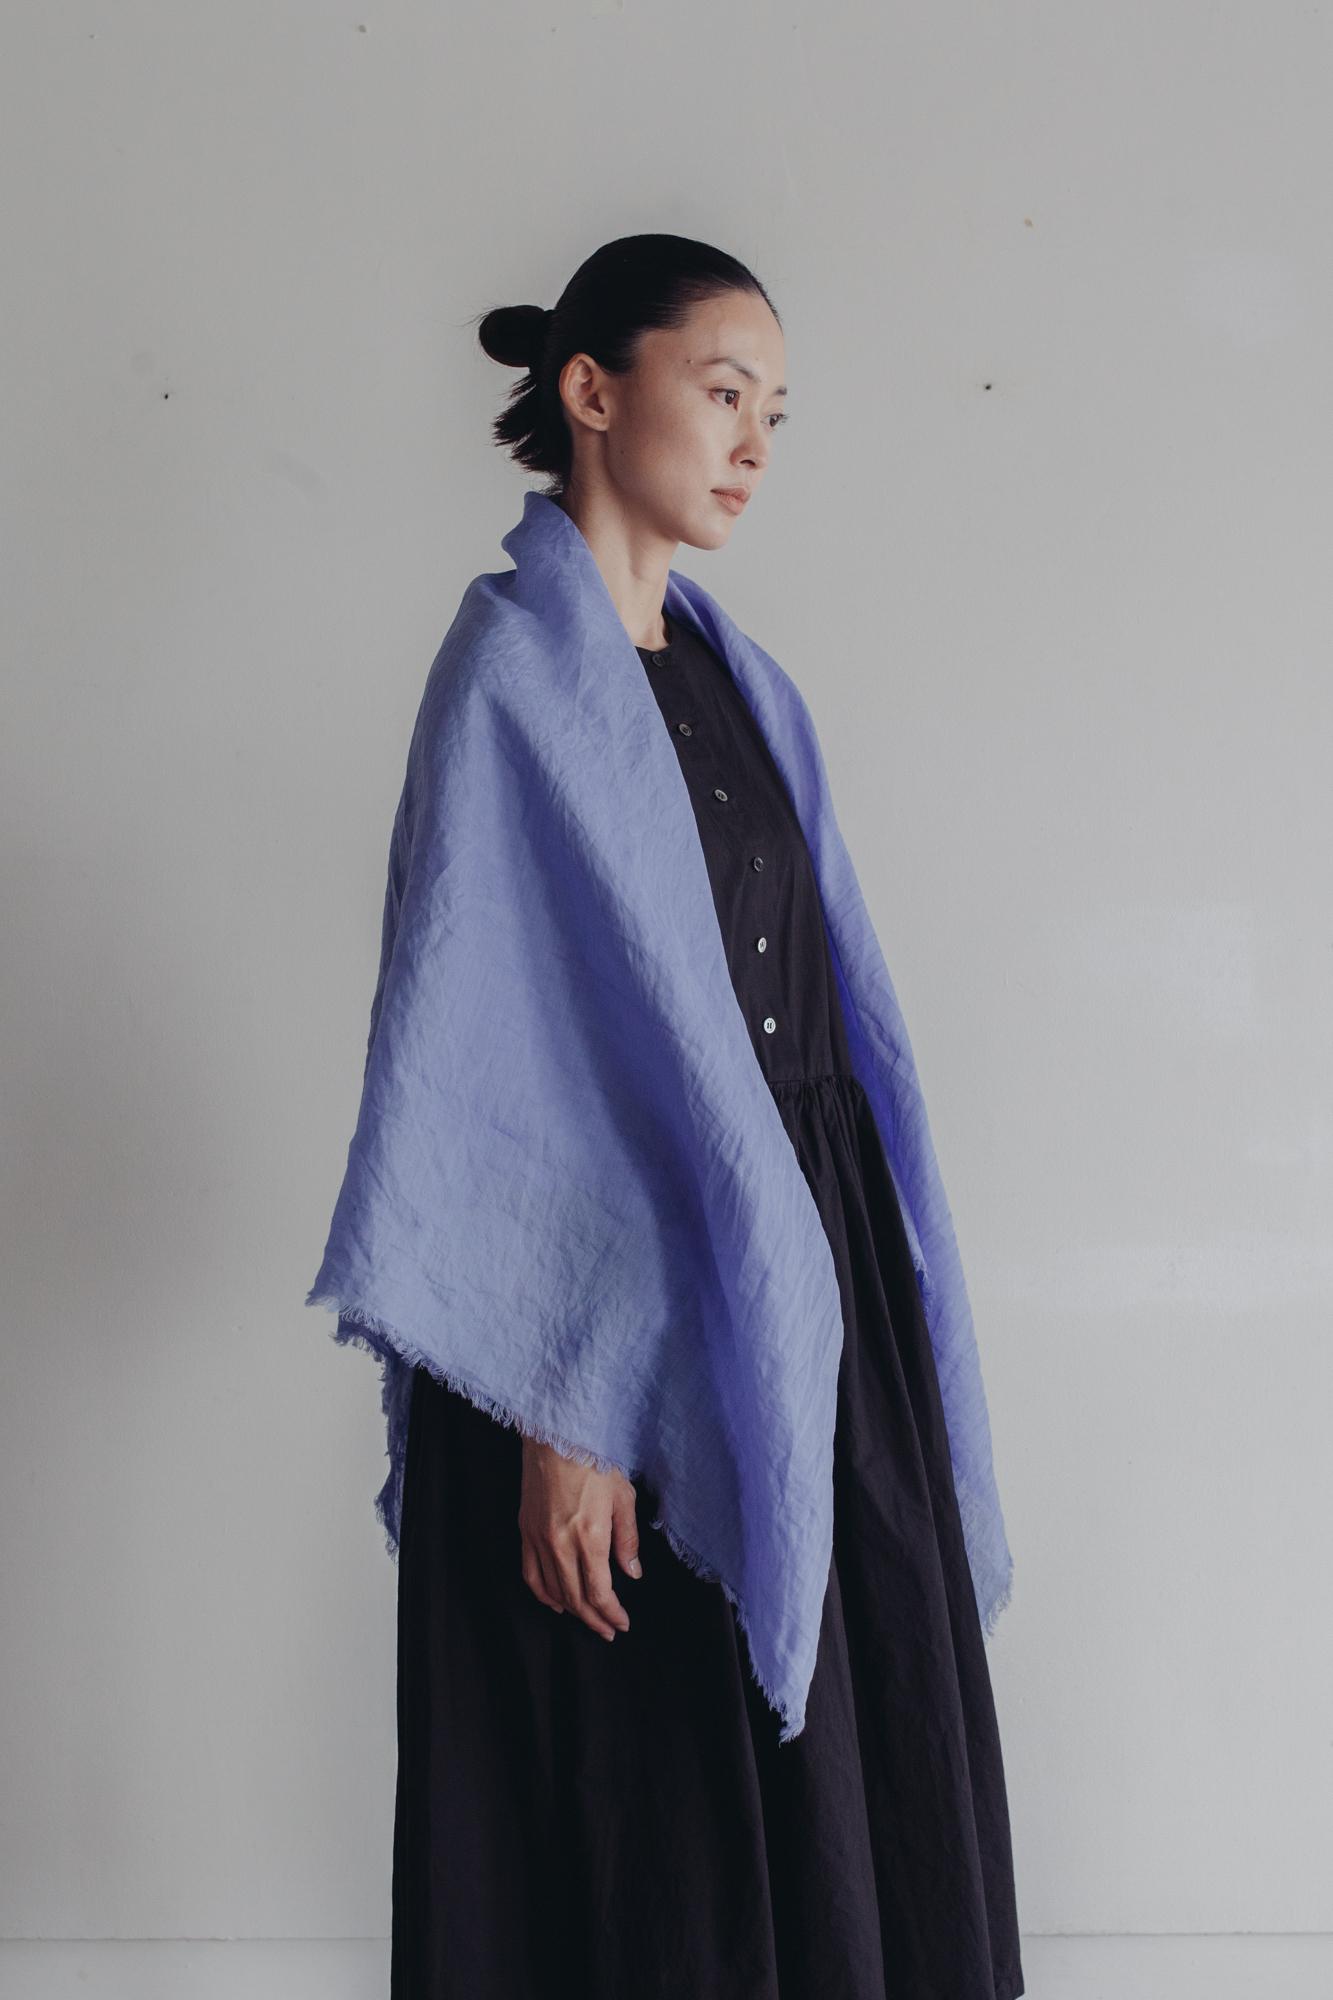 0158-2 120 ramie stole / sky blue